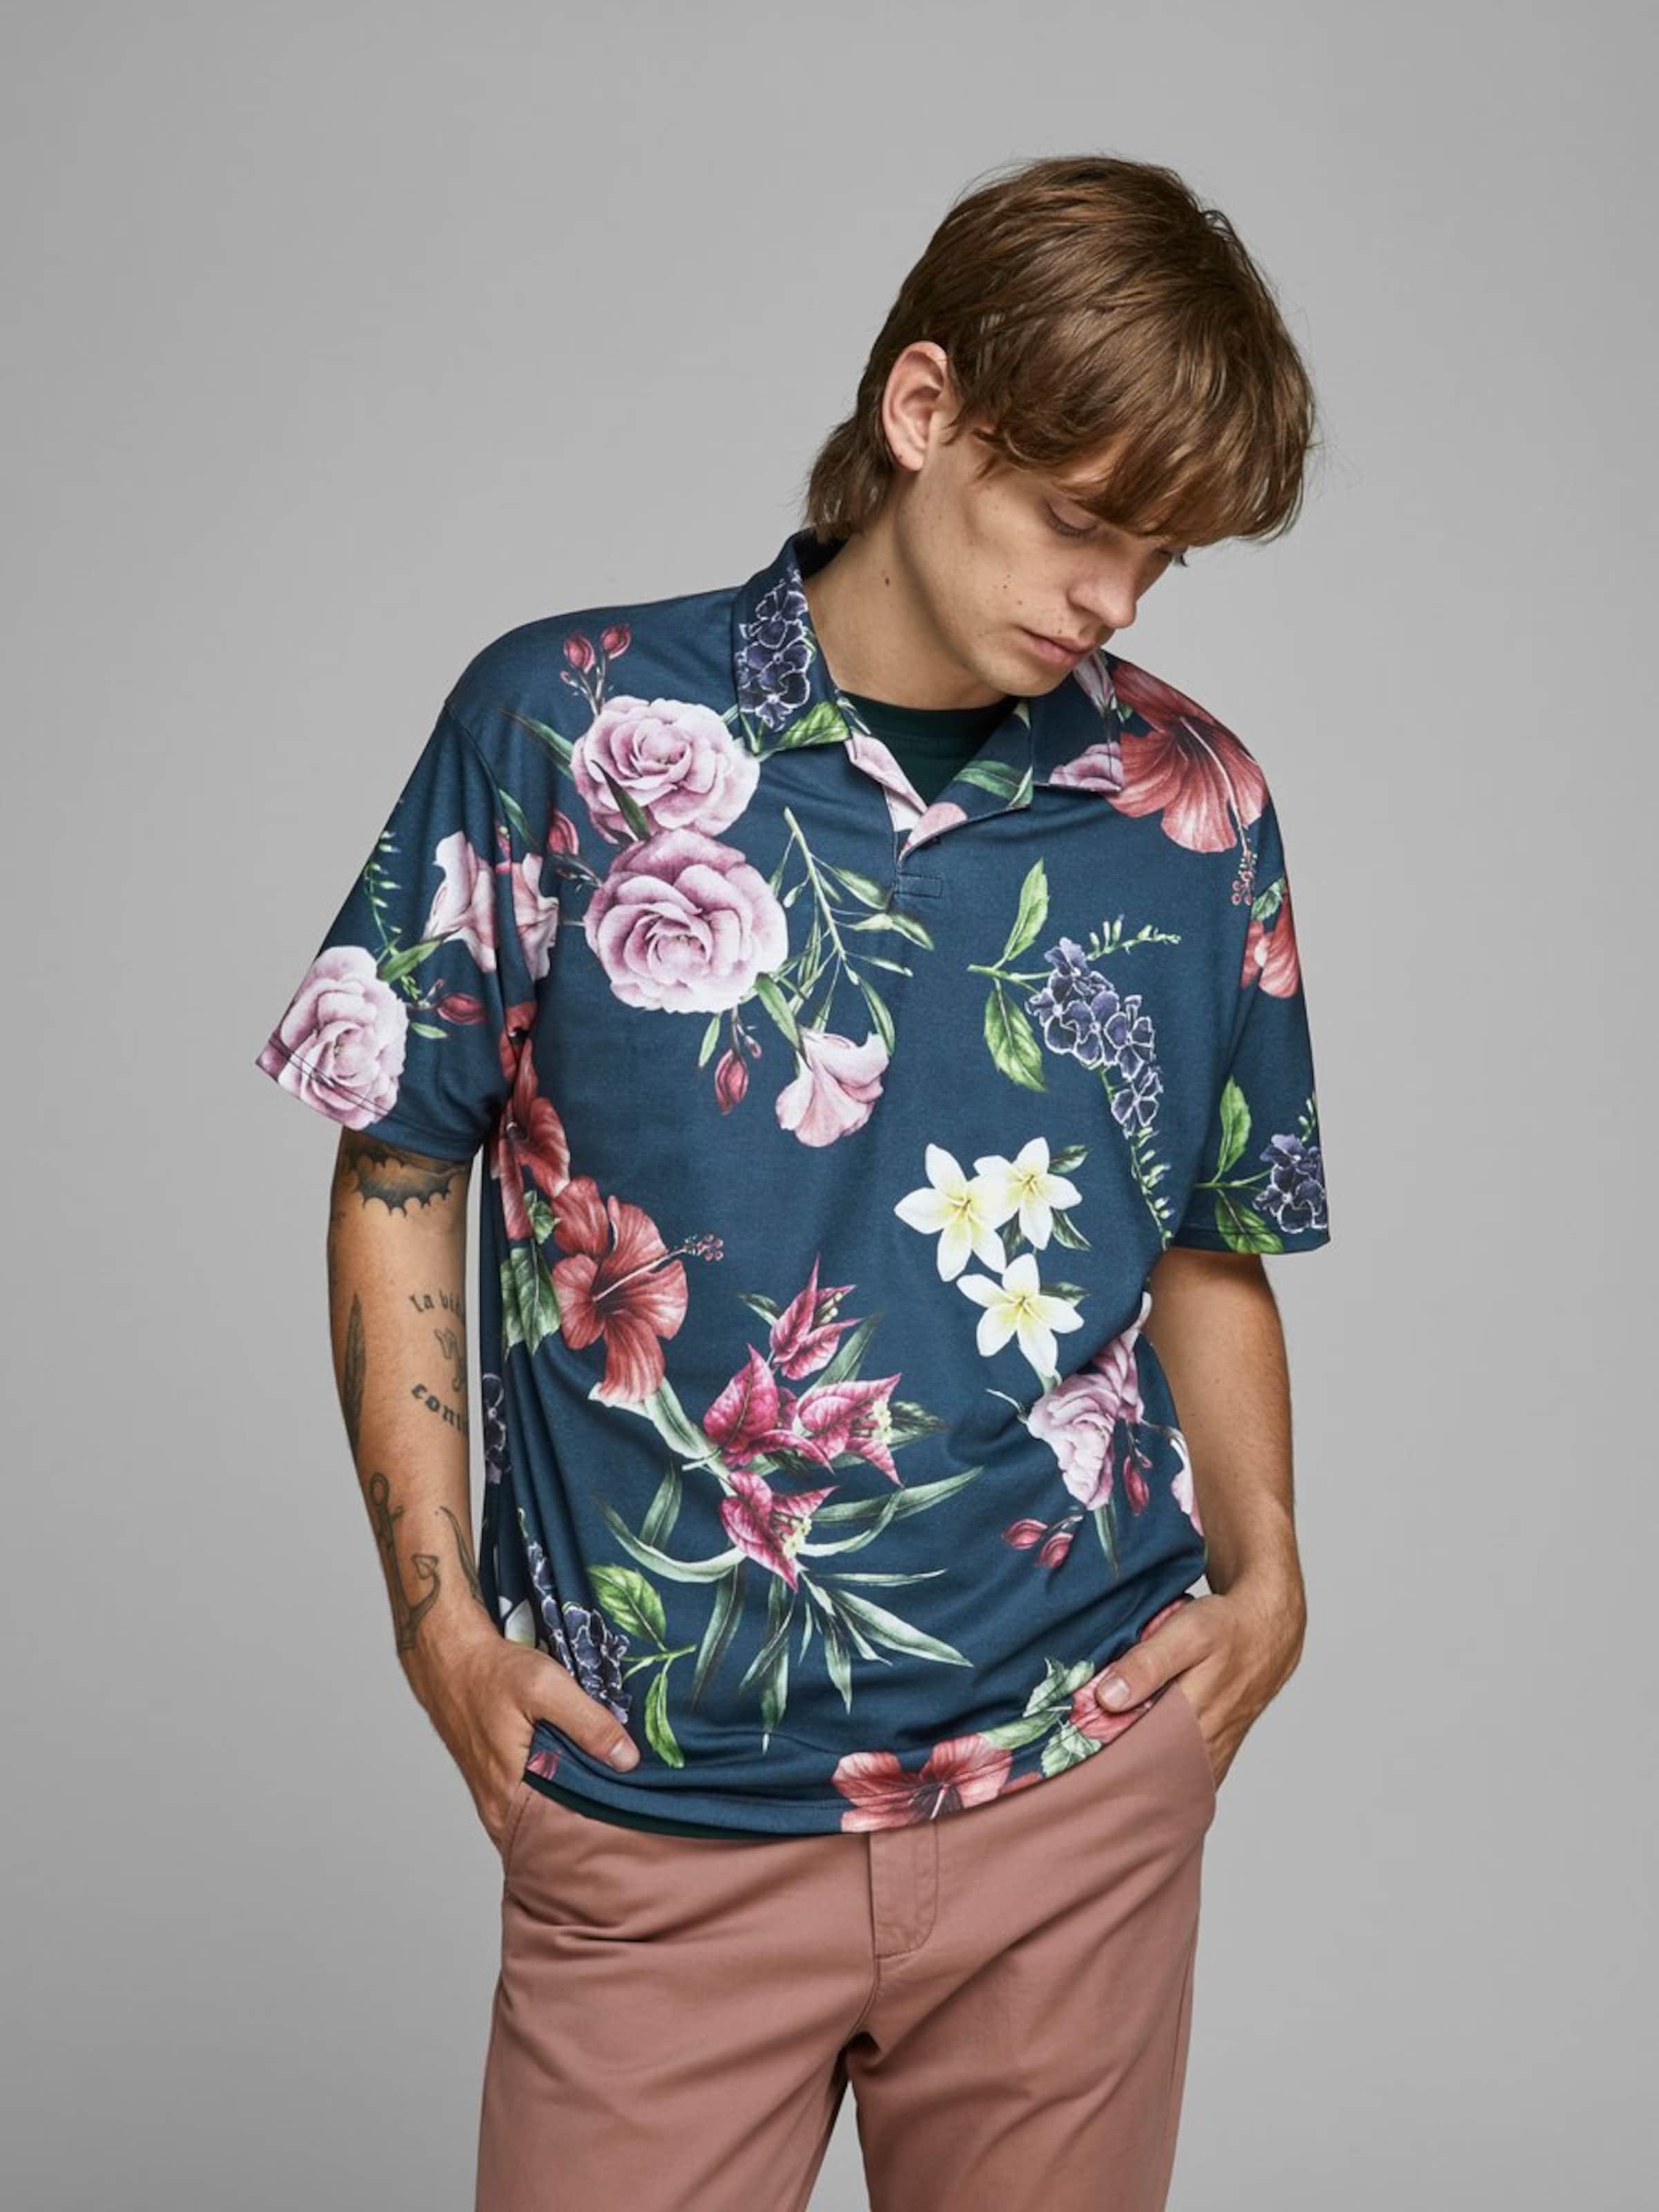 shirt T Mélange Jones En CouleursNoir Jackamp; De MUVGqSzp